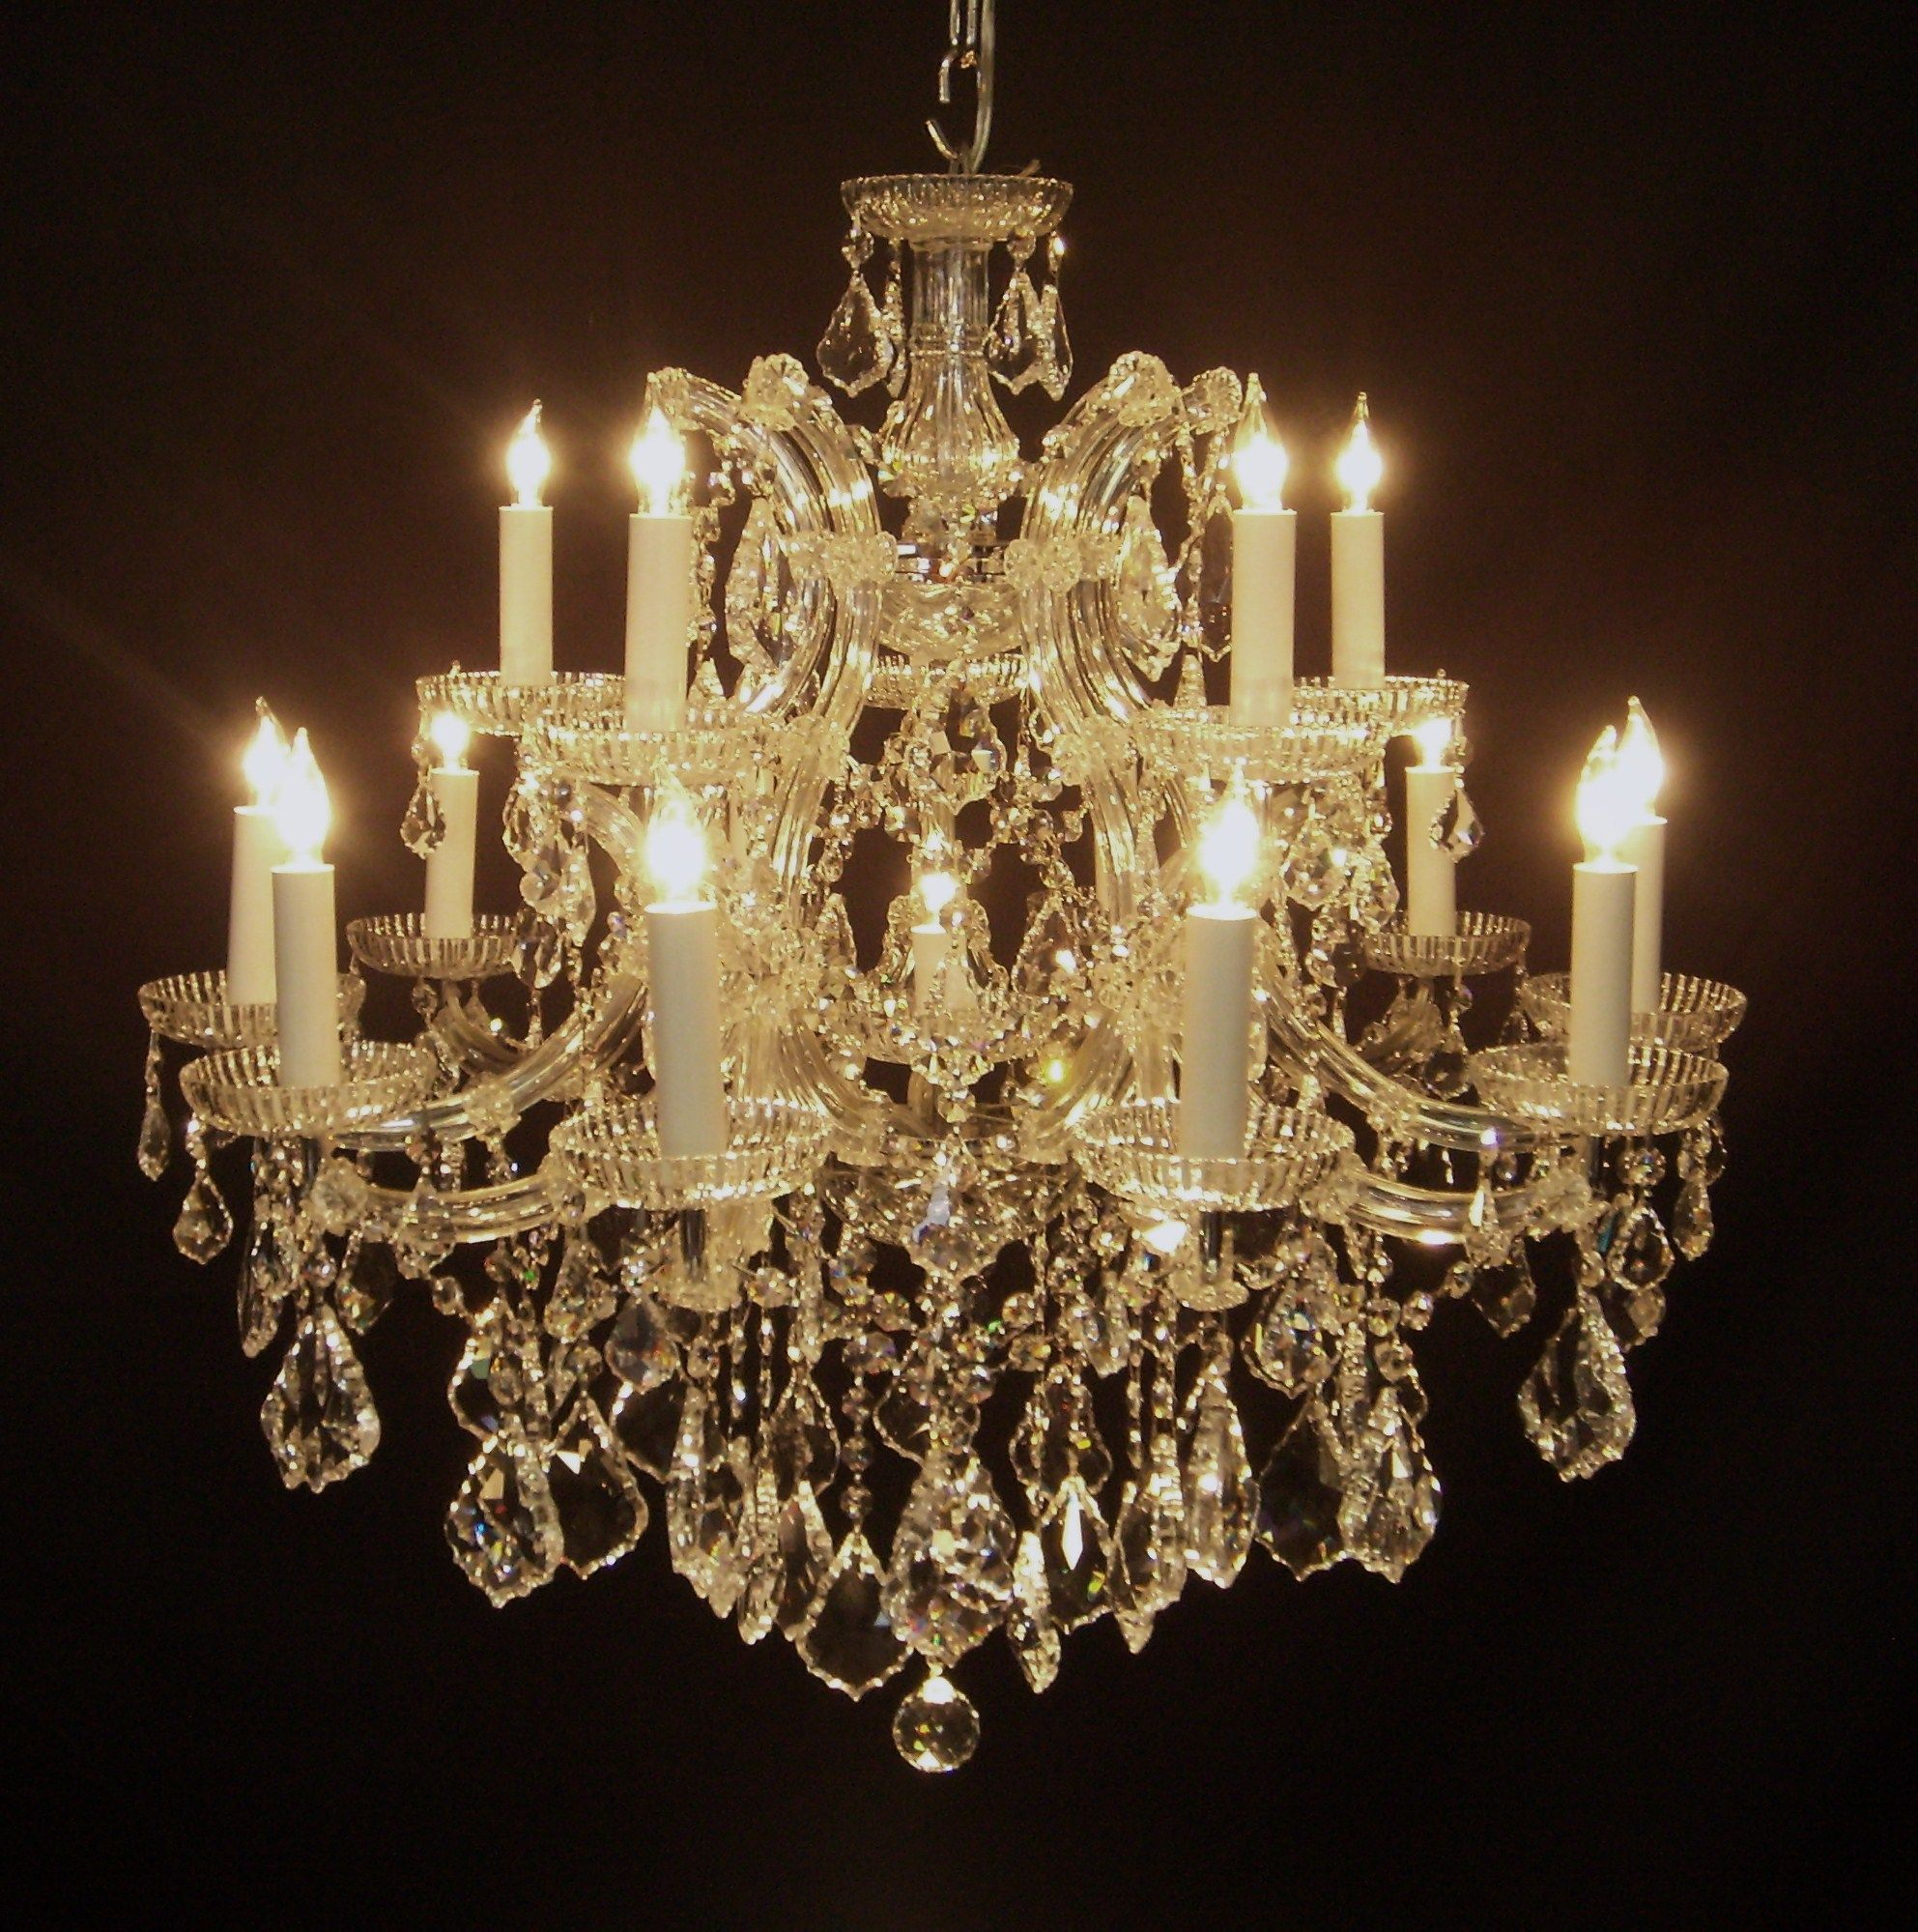 Antique Chandeliers 16 Light Silver Italian Crystal Chandelier